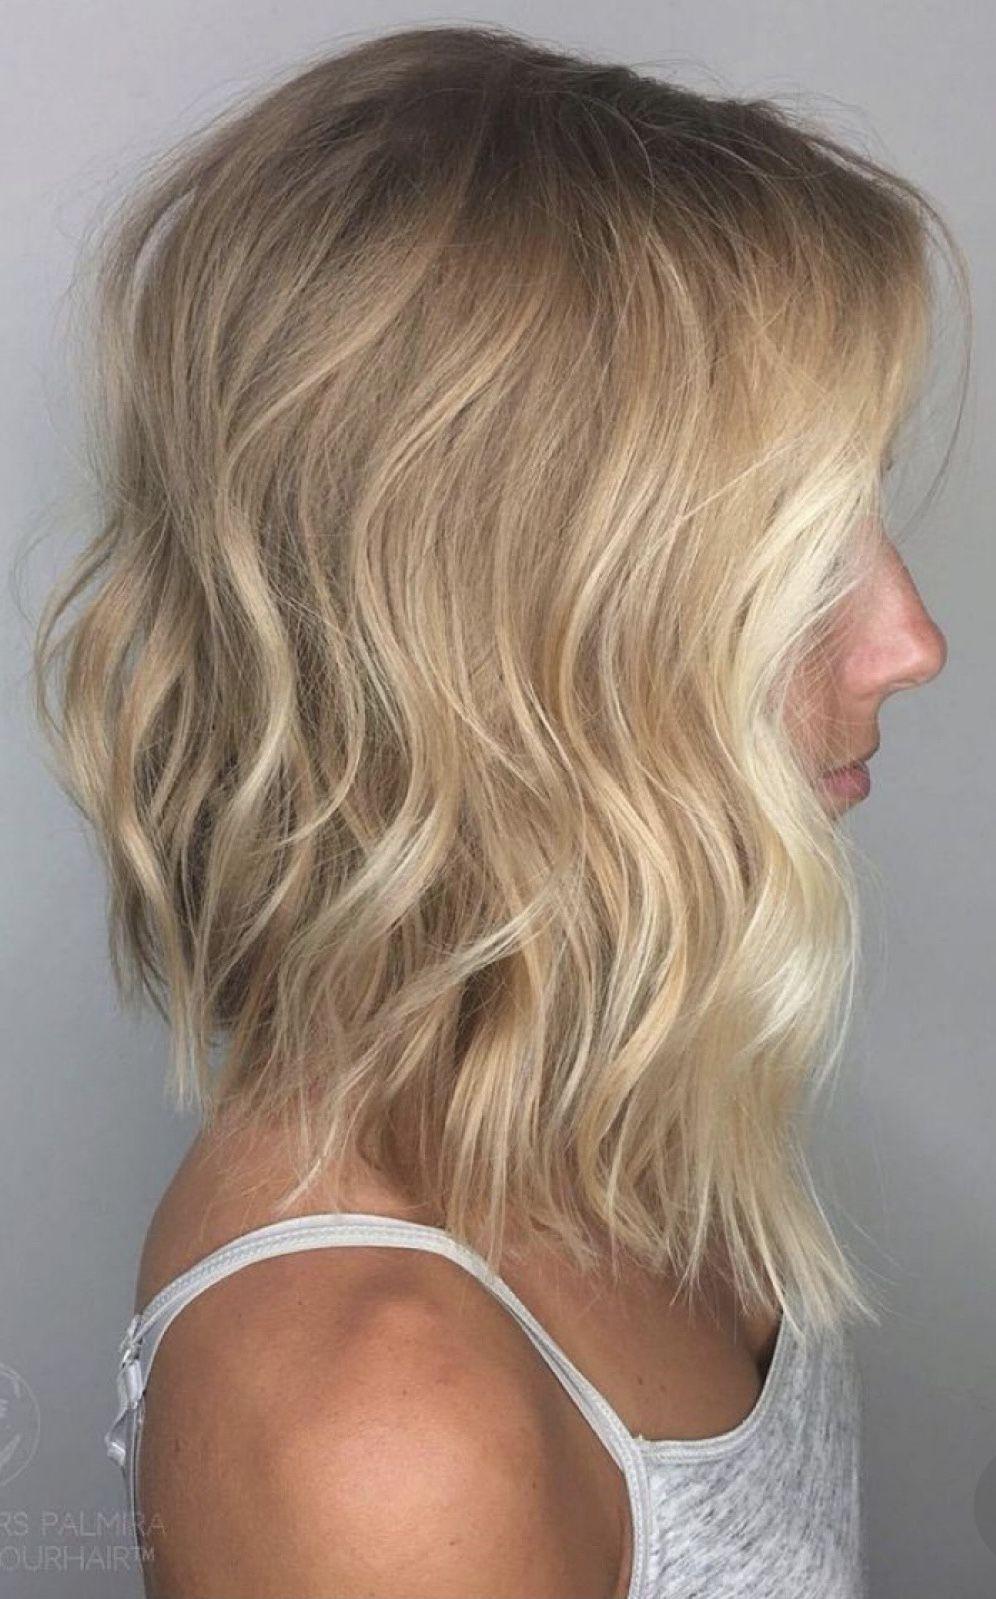 Concave Lob Long Bob Hairstyles Wavy Hairstyles Medium Medium Length Hair Styles